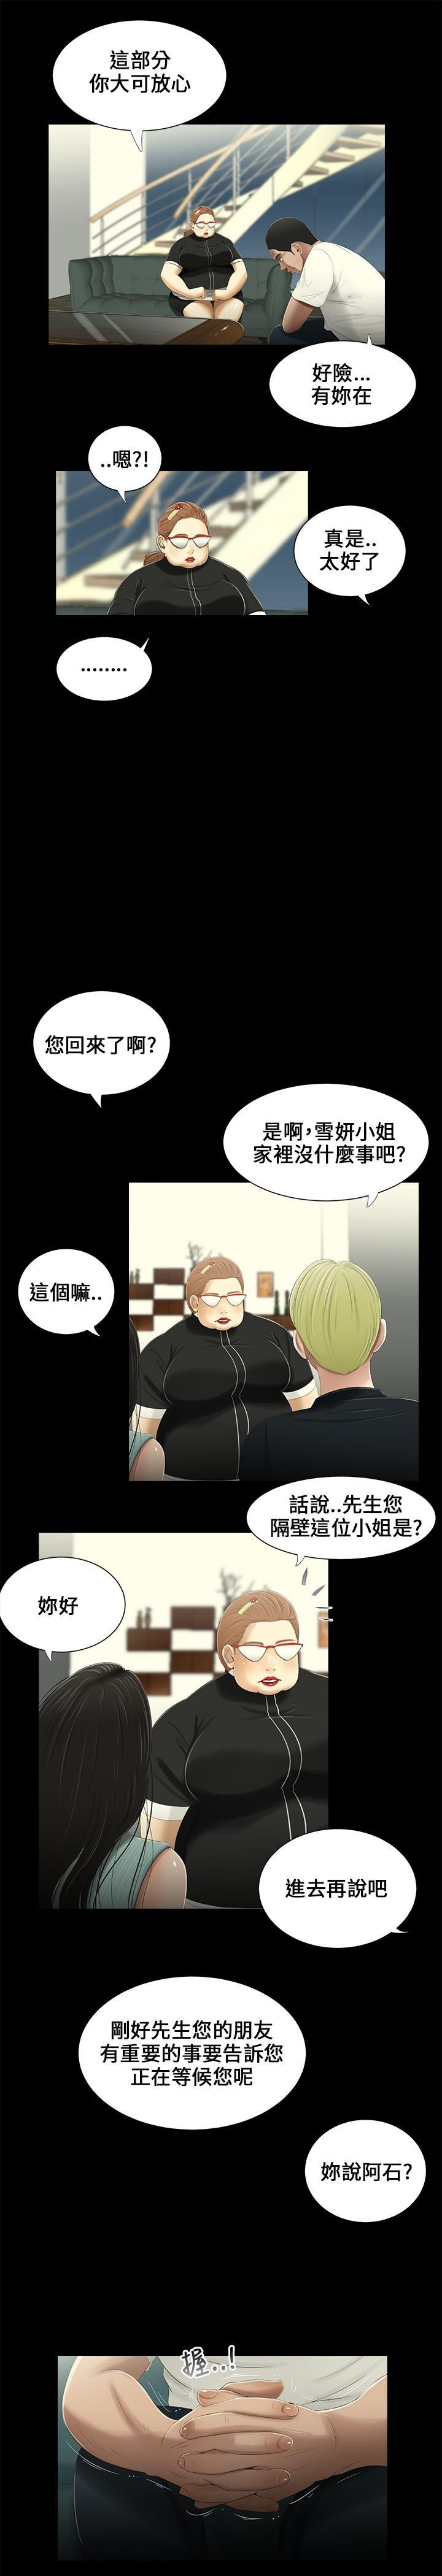 Three sisters 三姐妹Ch.13~19 (Chinese)中文 102